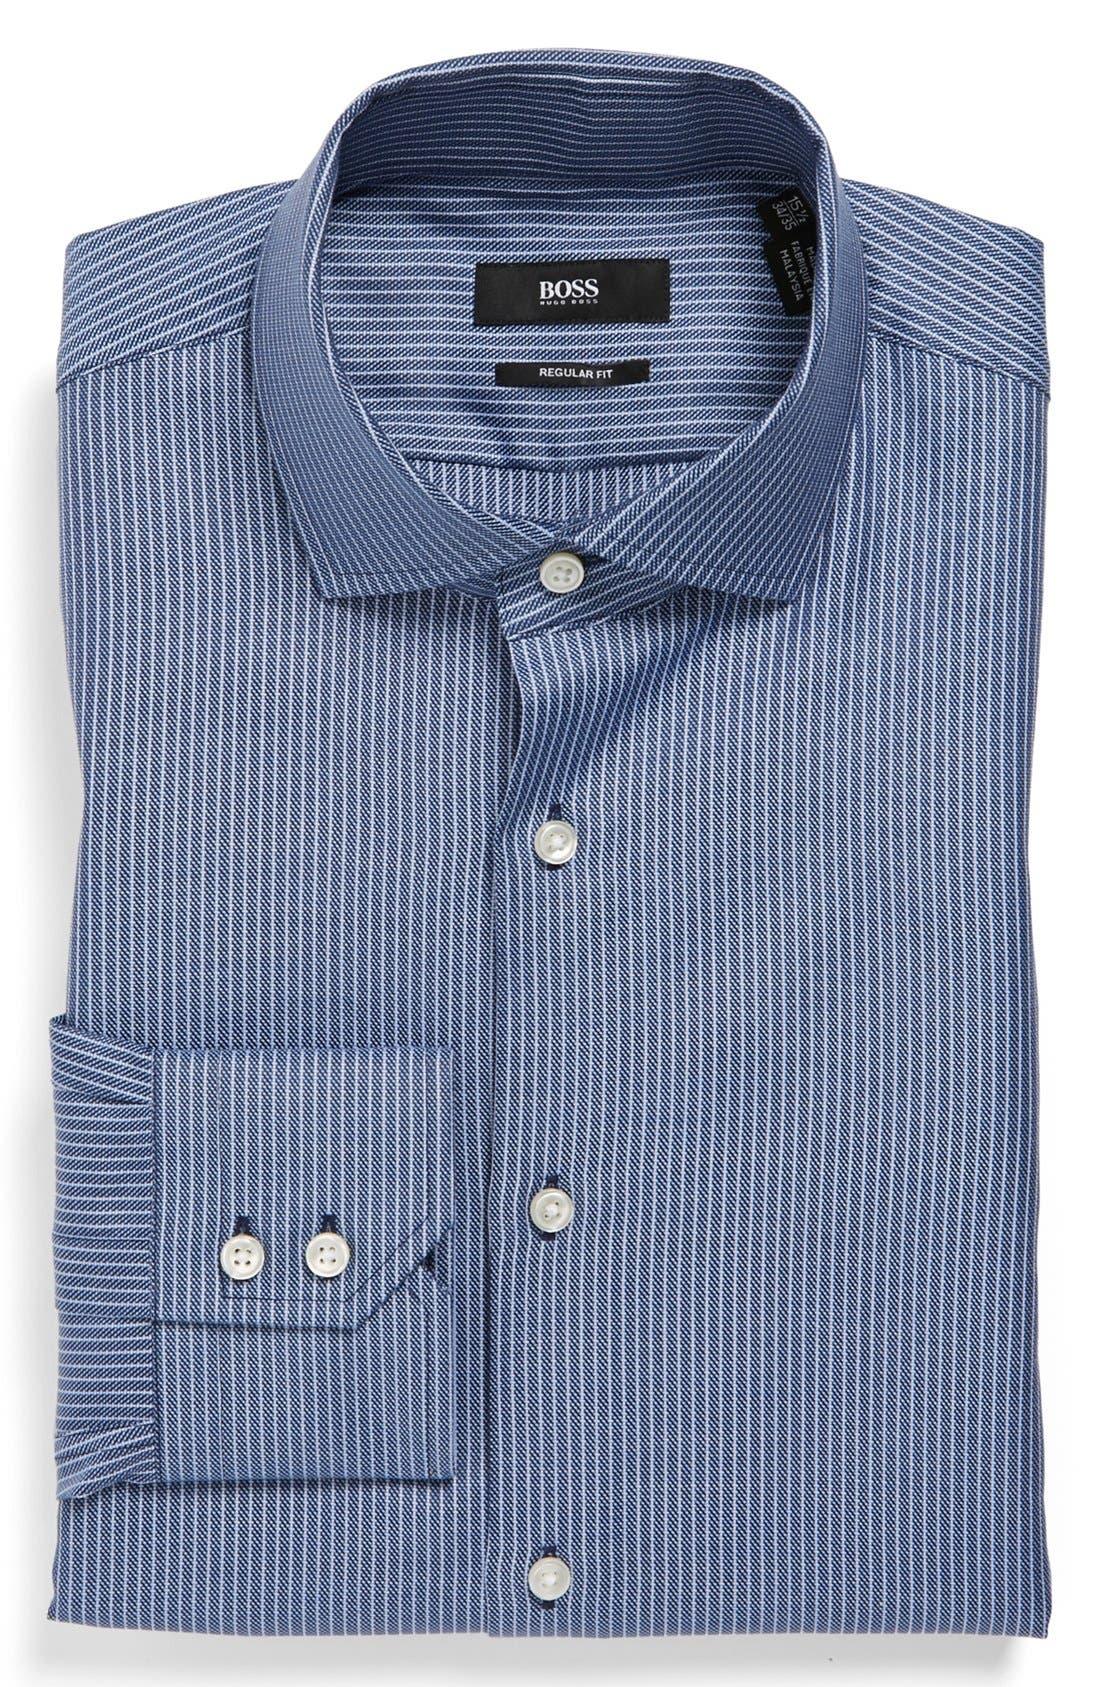 Alternate Image 1 Selected - BOSS HUGO BOSS 'Gordon' US Regular Fit Dress Shirt